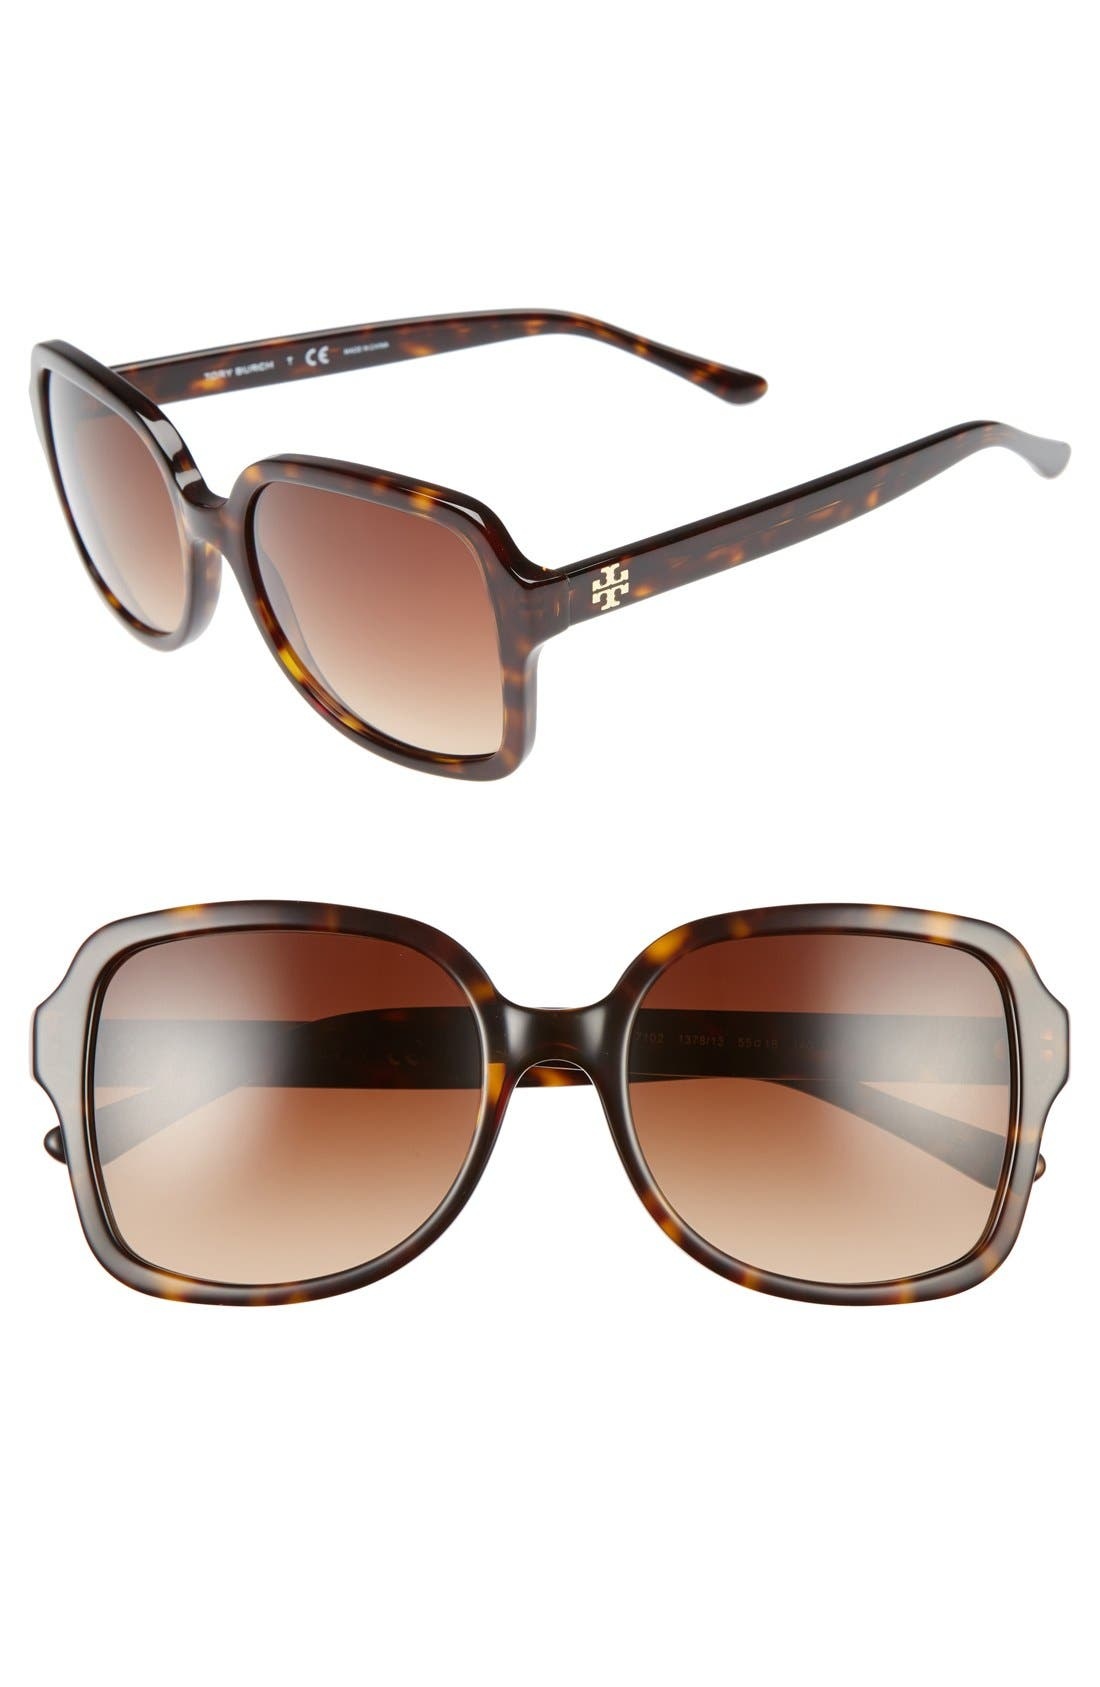 Main Image - Tory Burch 55mm Square Sunglasses